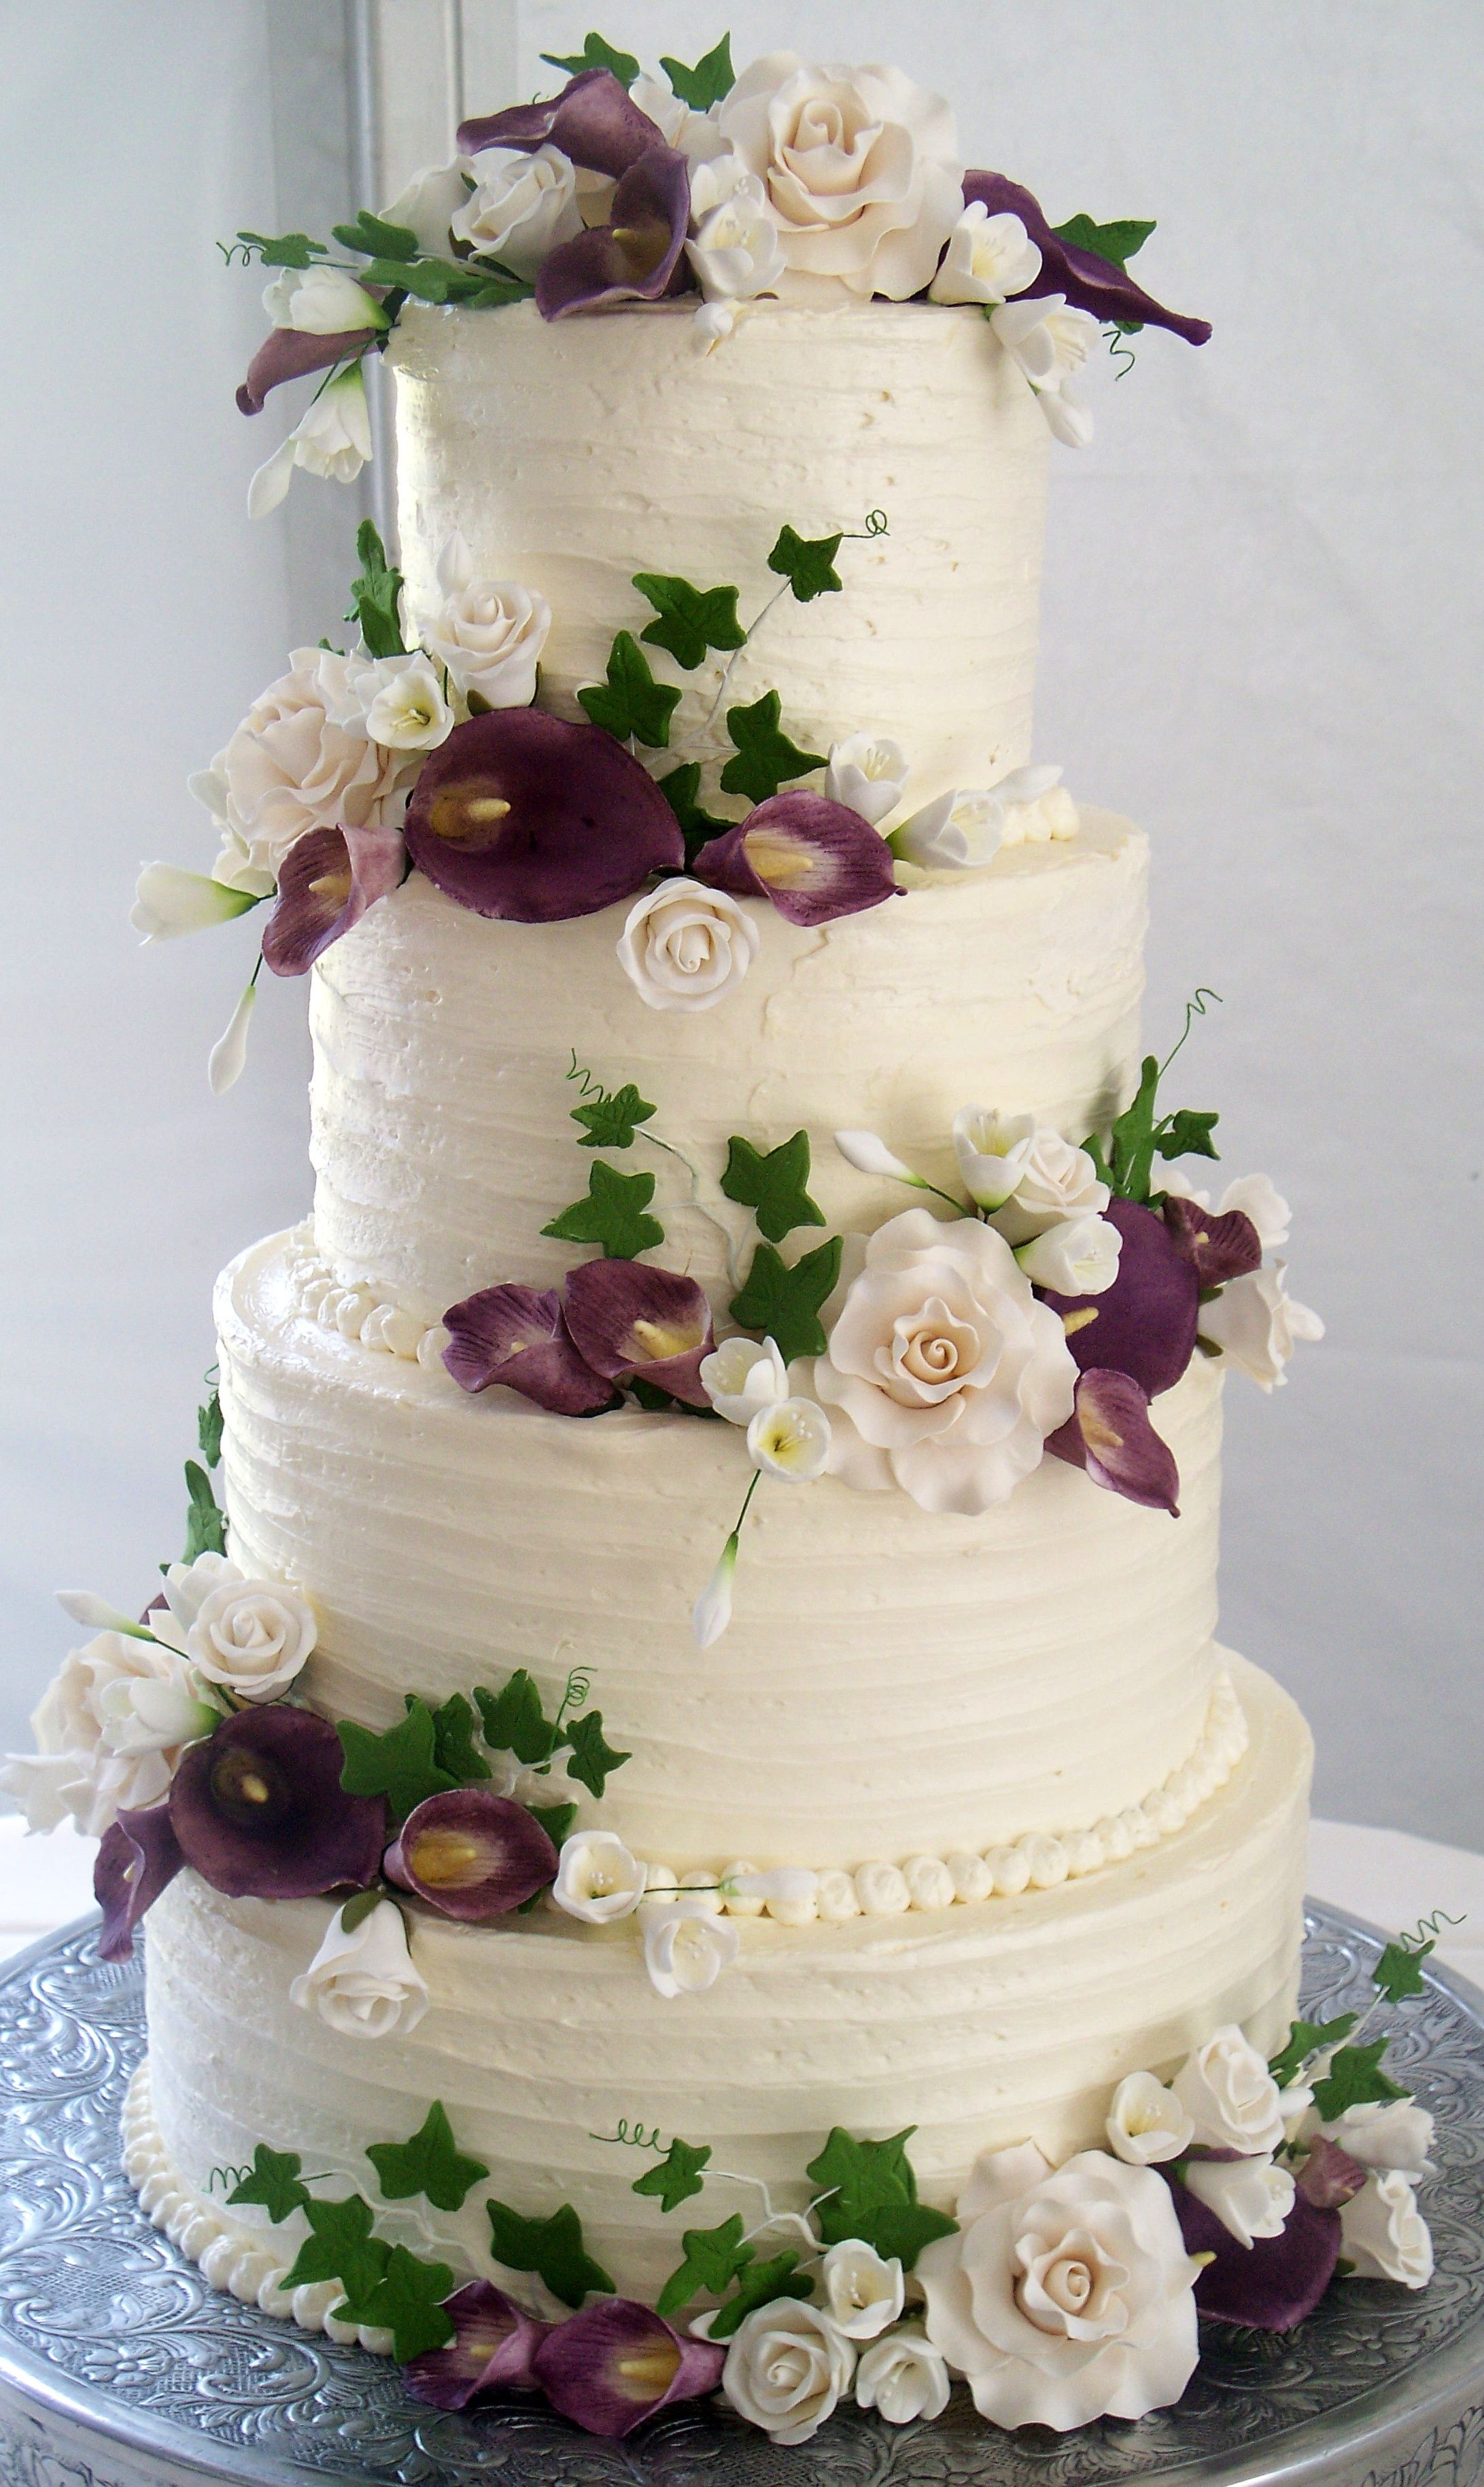 Wedding Cakes 4 Tier  4 tier wedding cake textured buttercream and coordinating